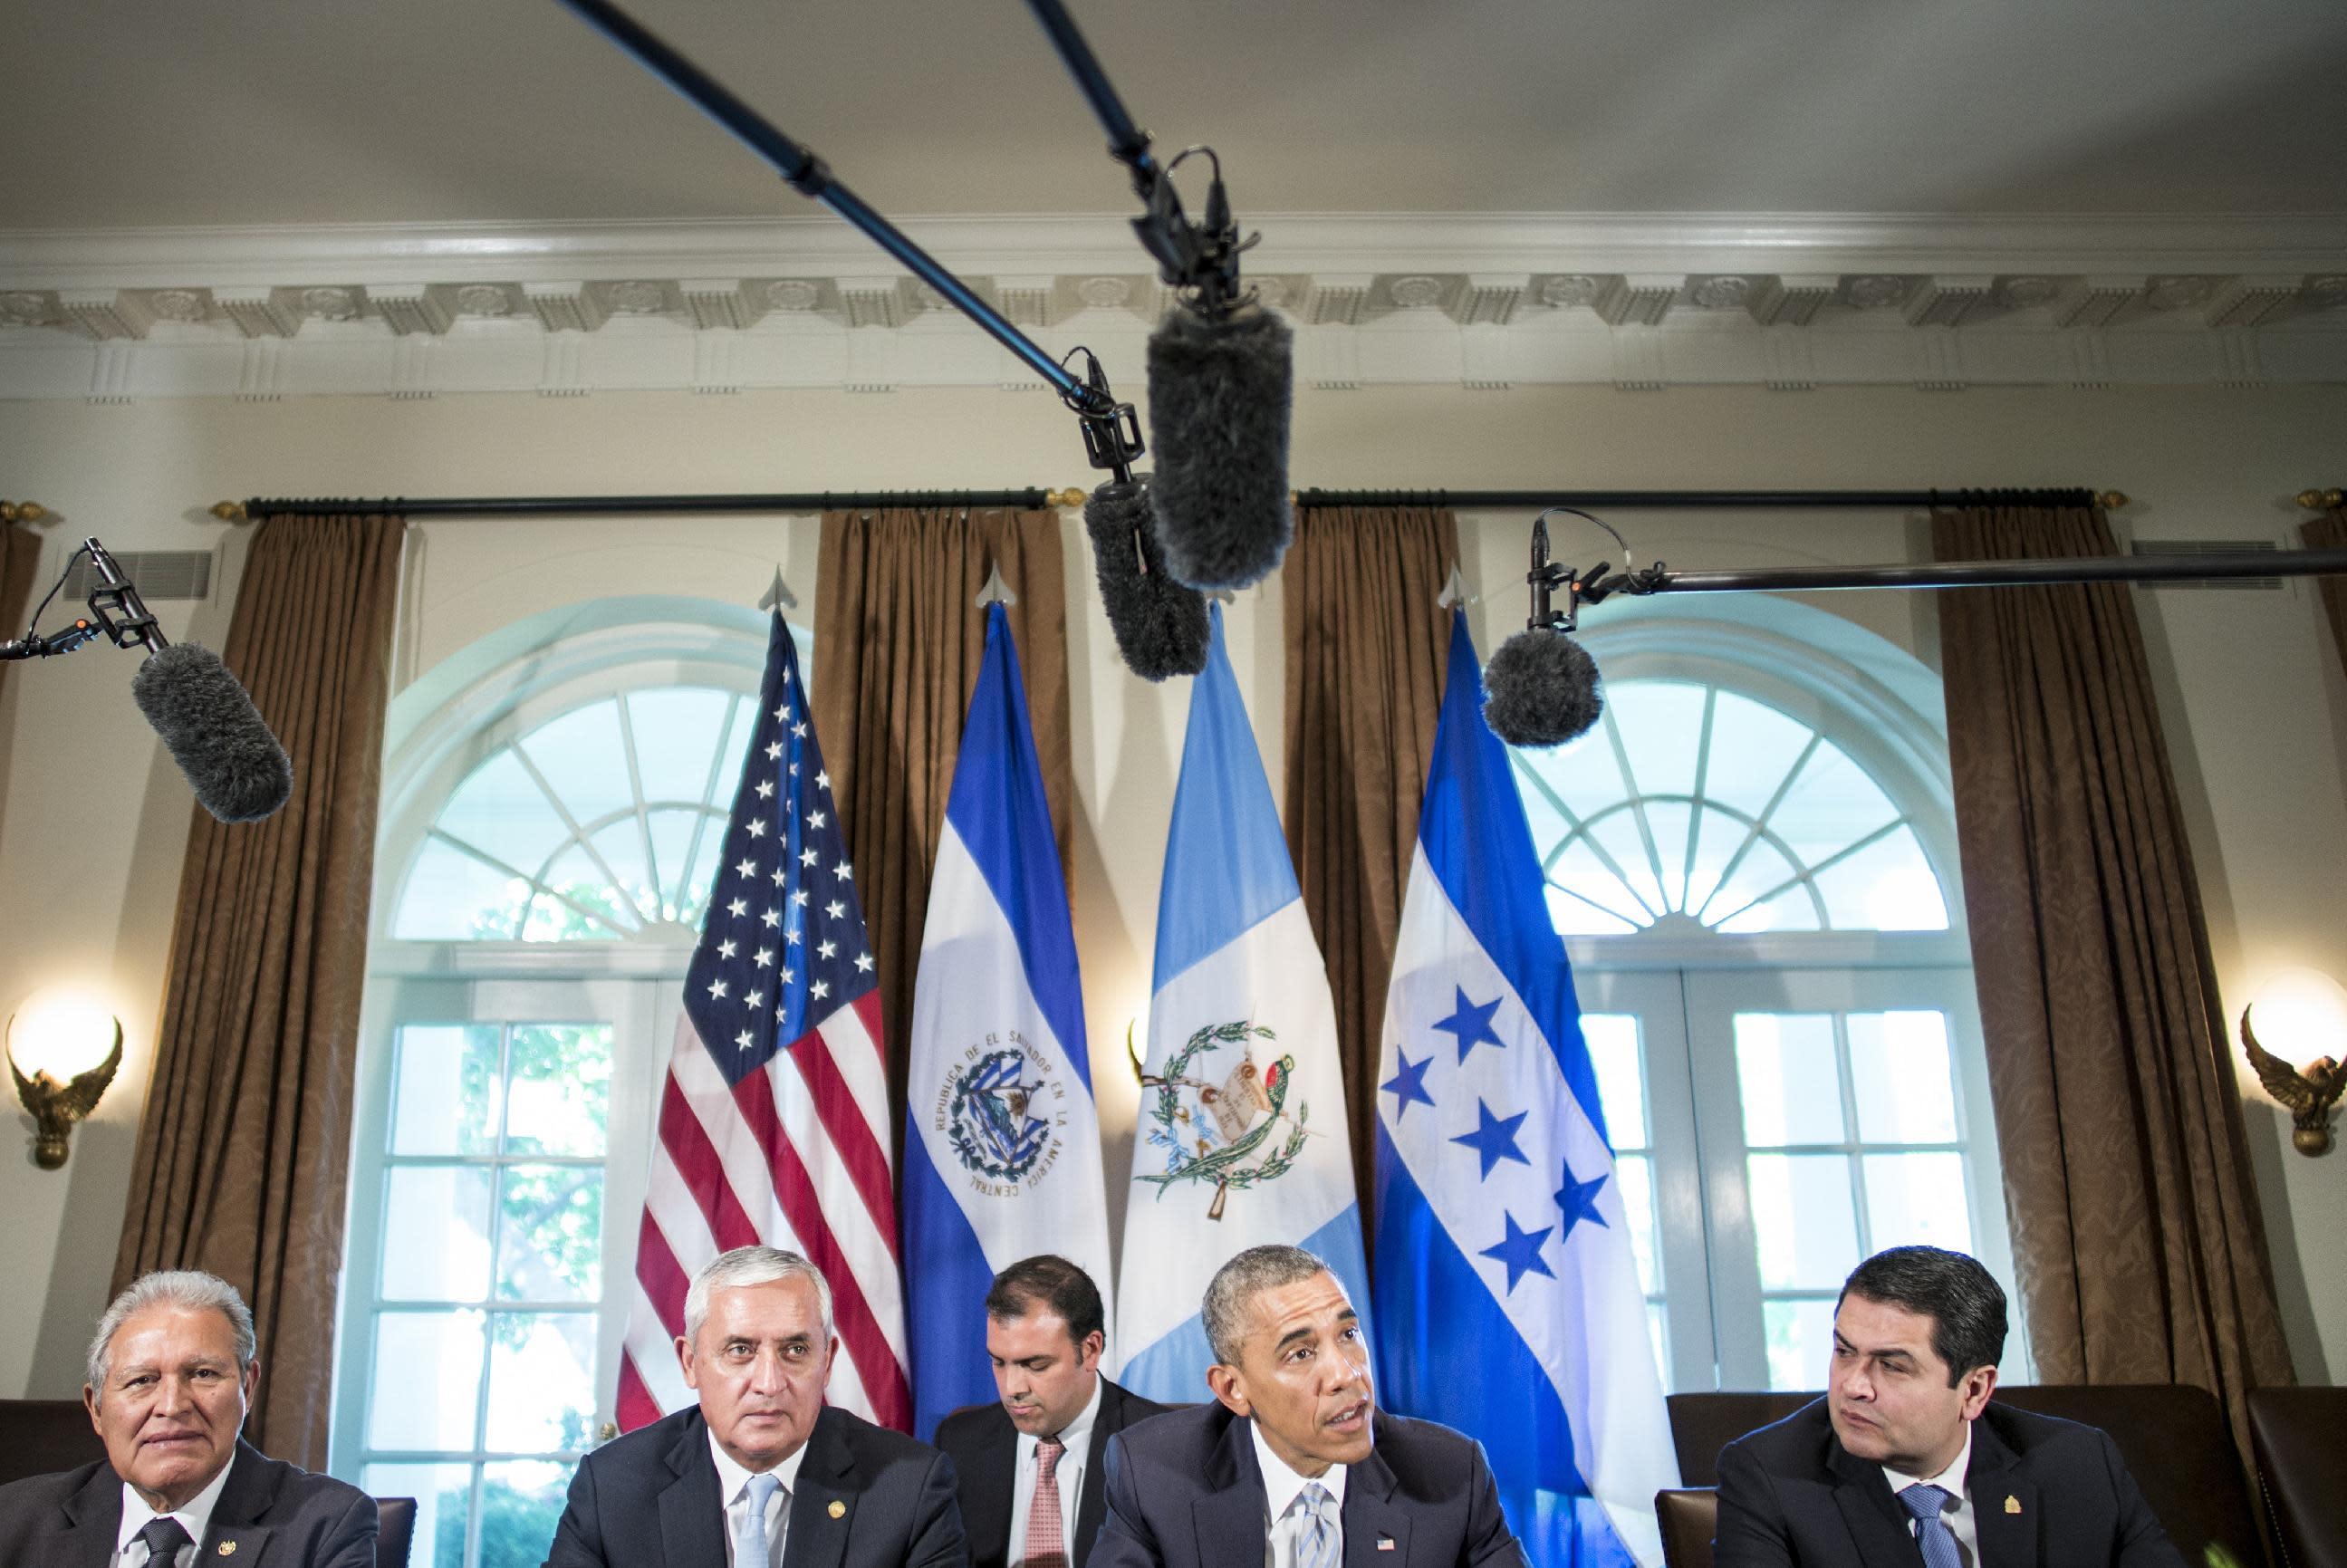 President of El Salvador Salvador Sanchez Ceren (L), President of Guatemala Otto Perez Molina (2-L) and President of Honduras Juan Orlando Hernandez (R) listen while US President Barack Obama speaks to the press on July 25, 2014 in Washington (AFP Photo/Brendan Smialowski)